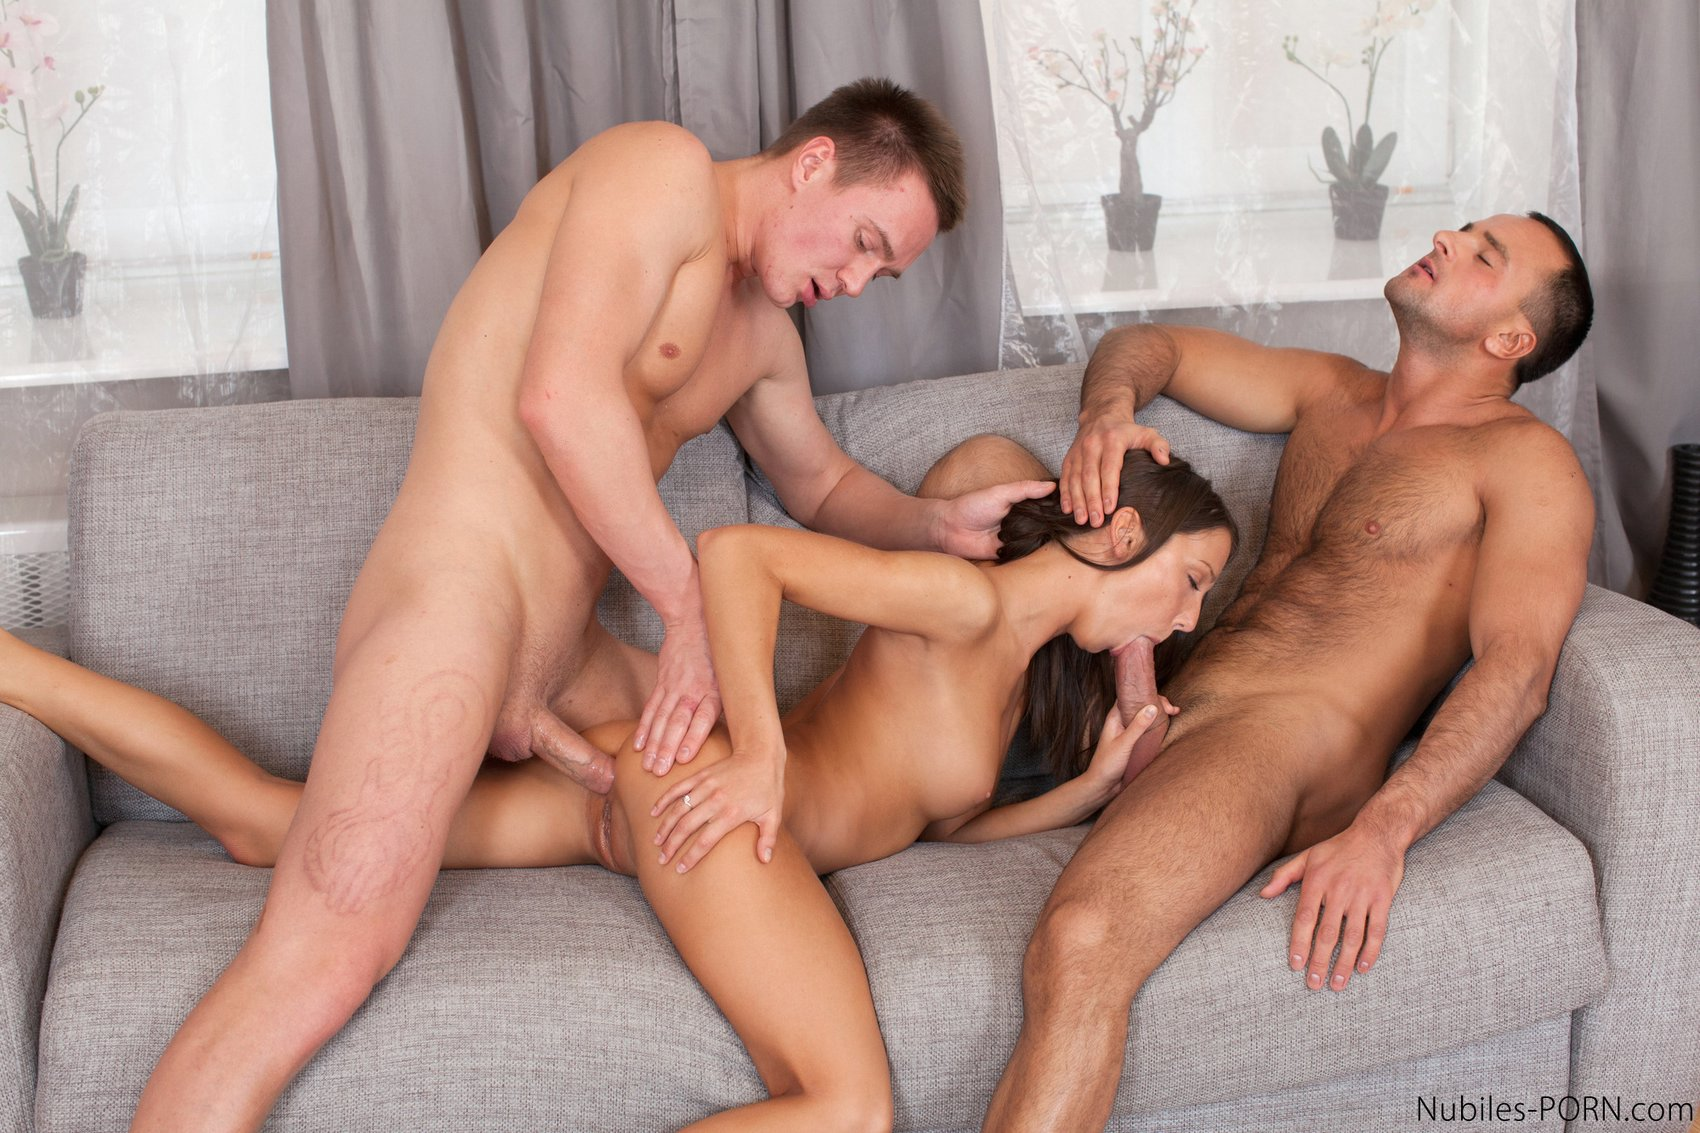 Sarvent hardcore sex pic gallary sex scene